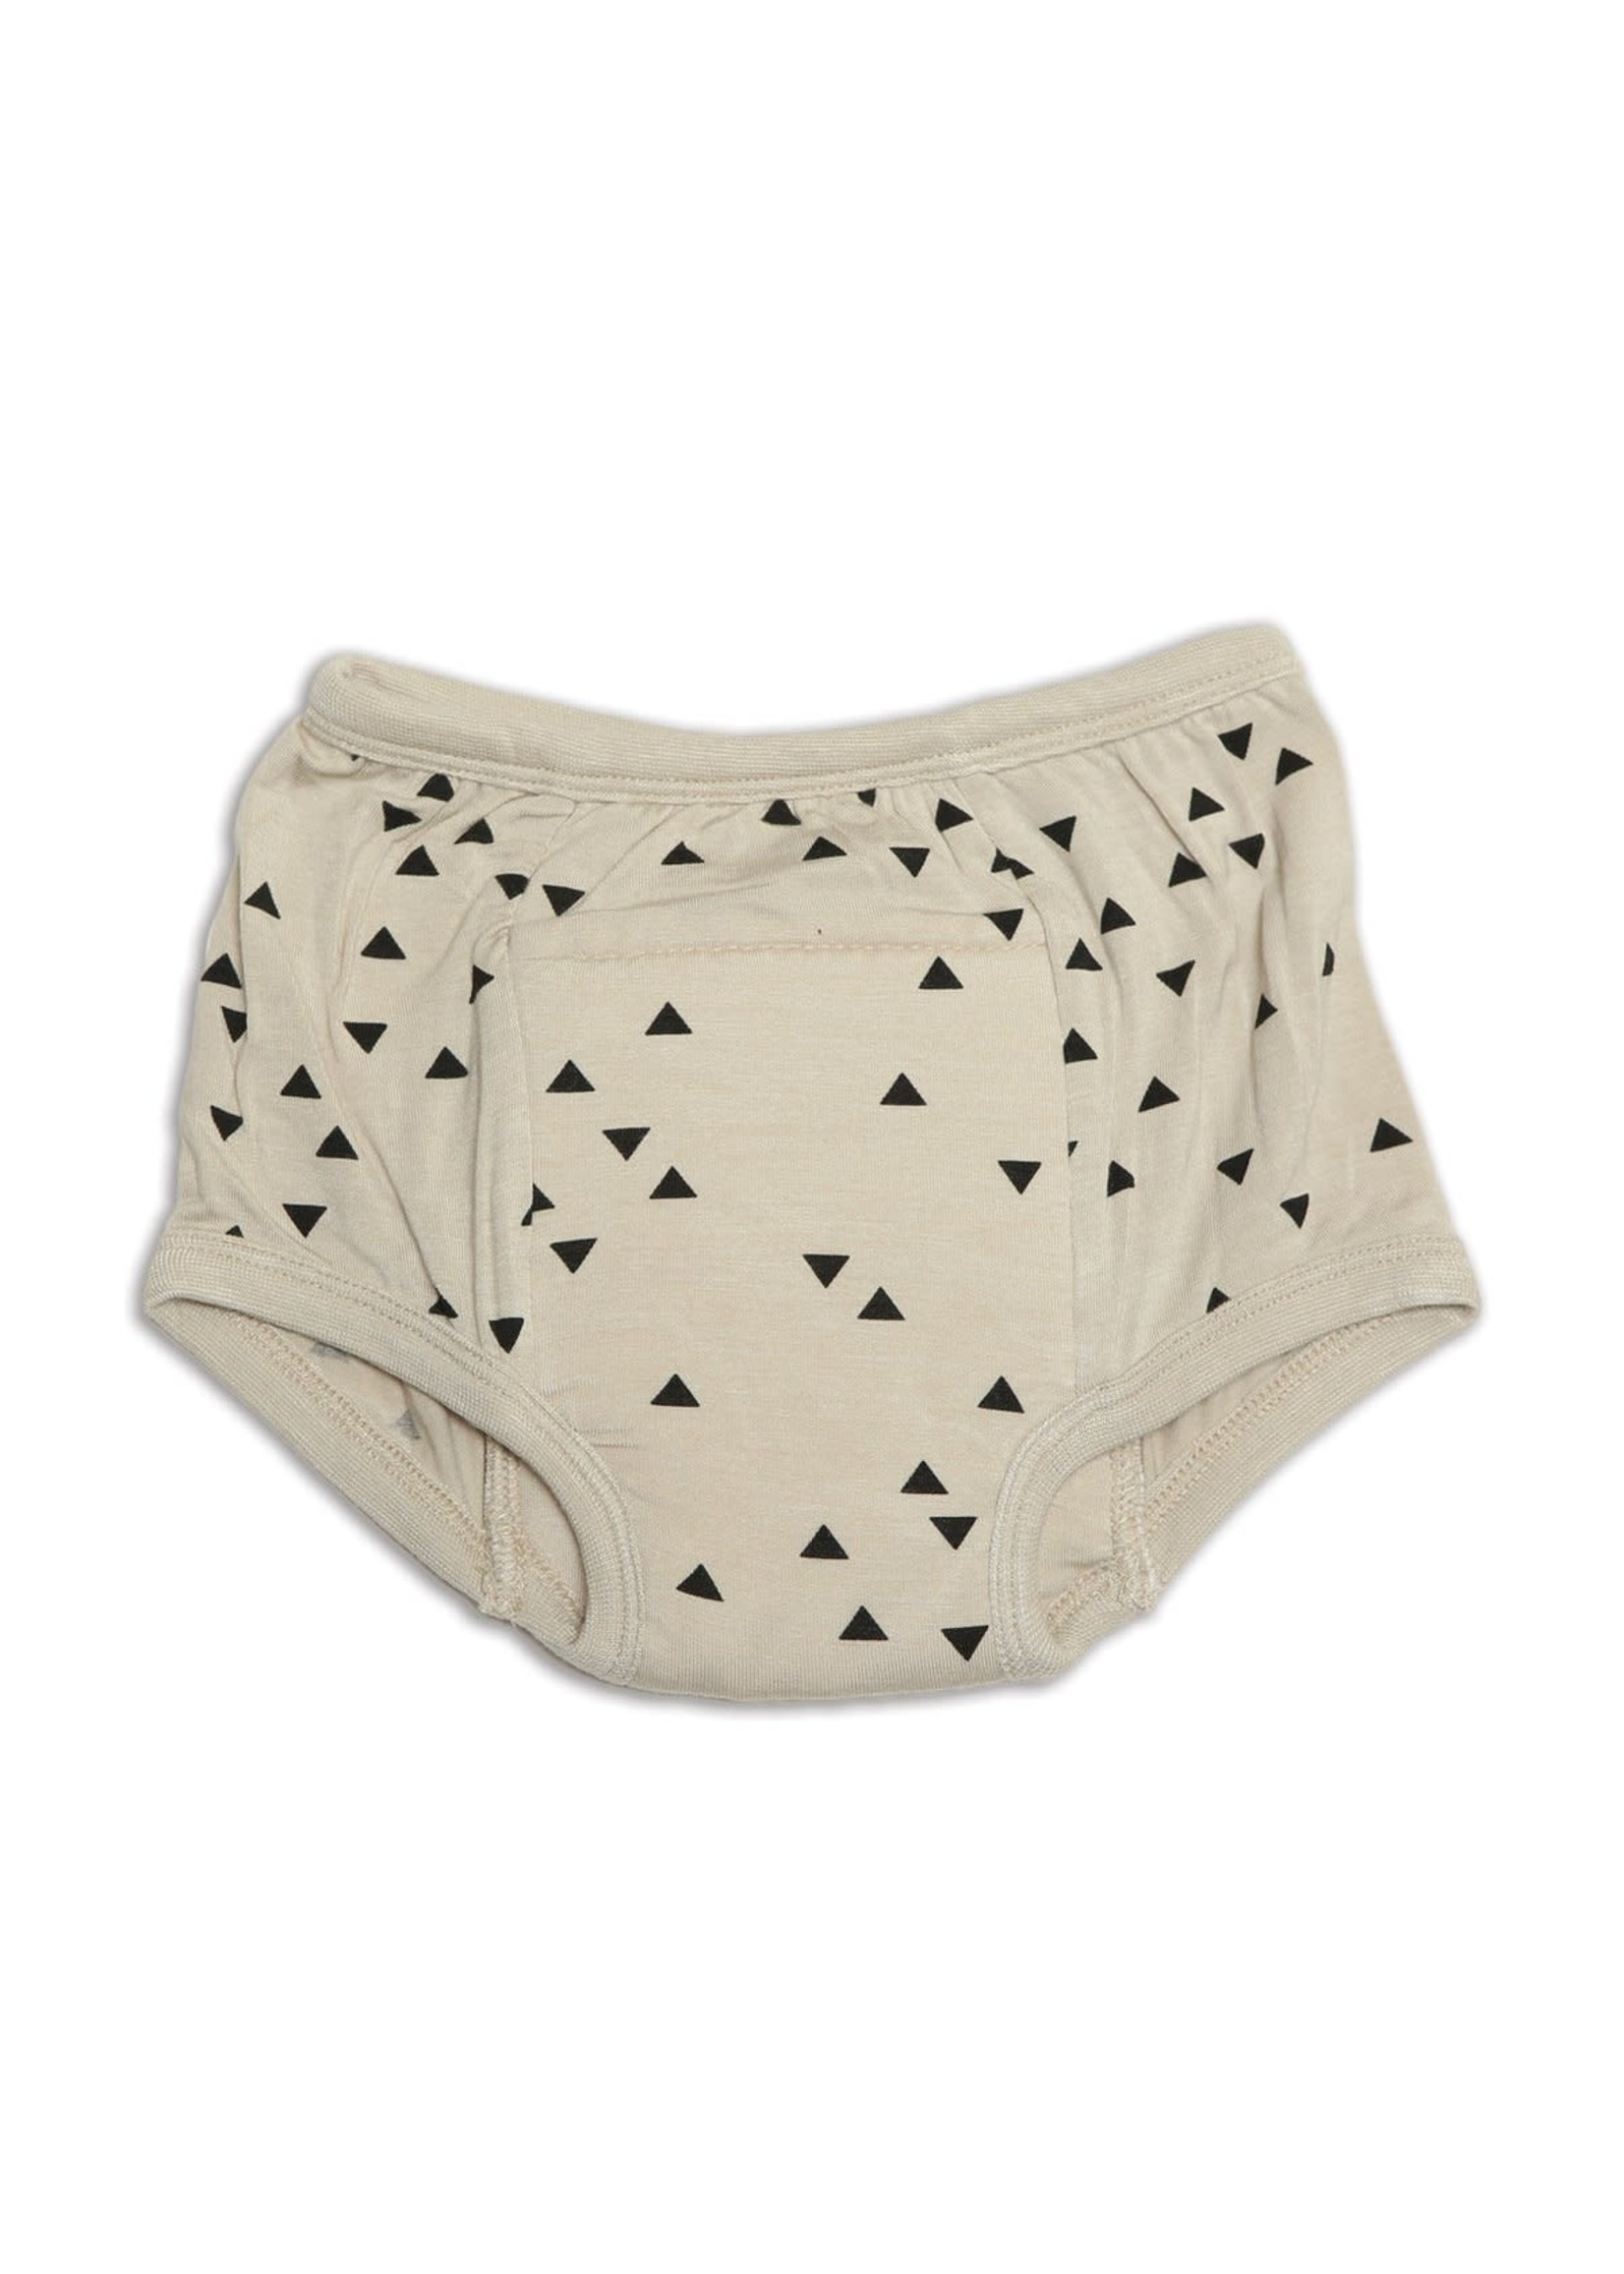 silkberry SB Training Pant (Apex Triangle)